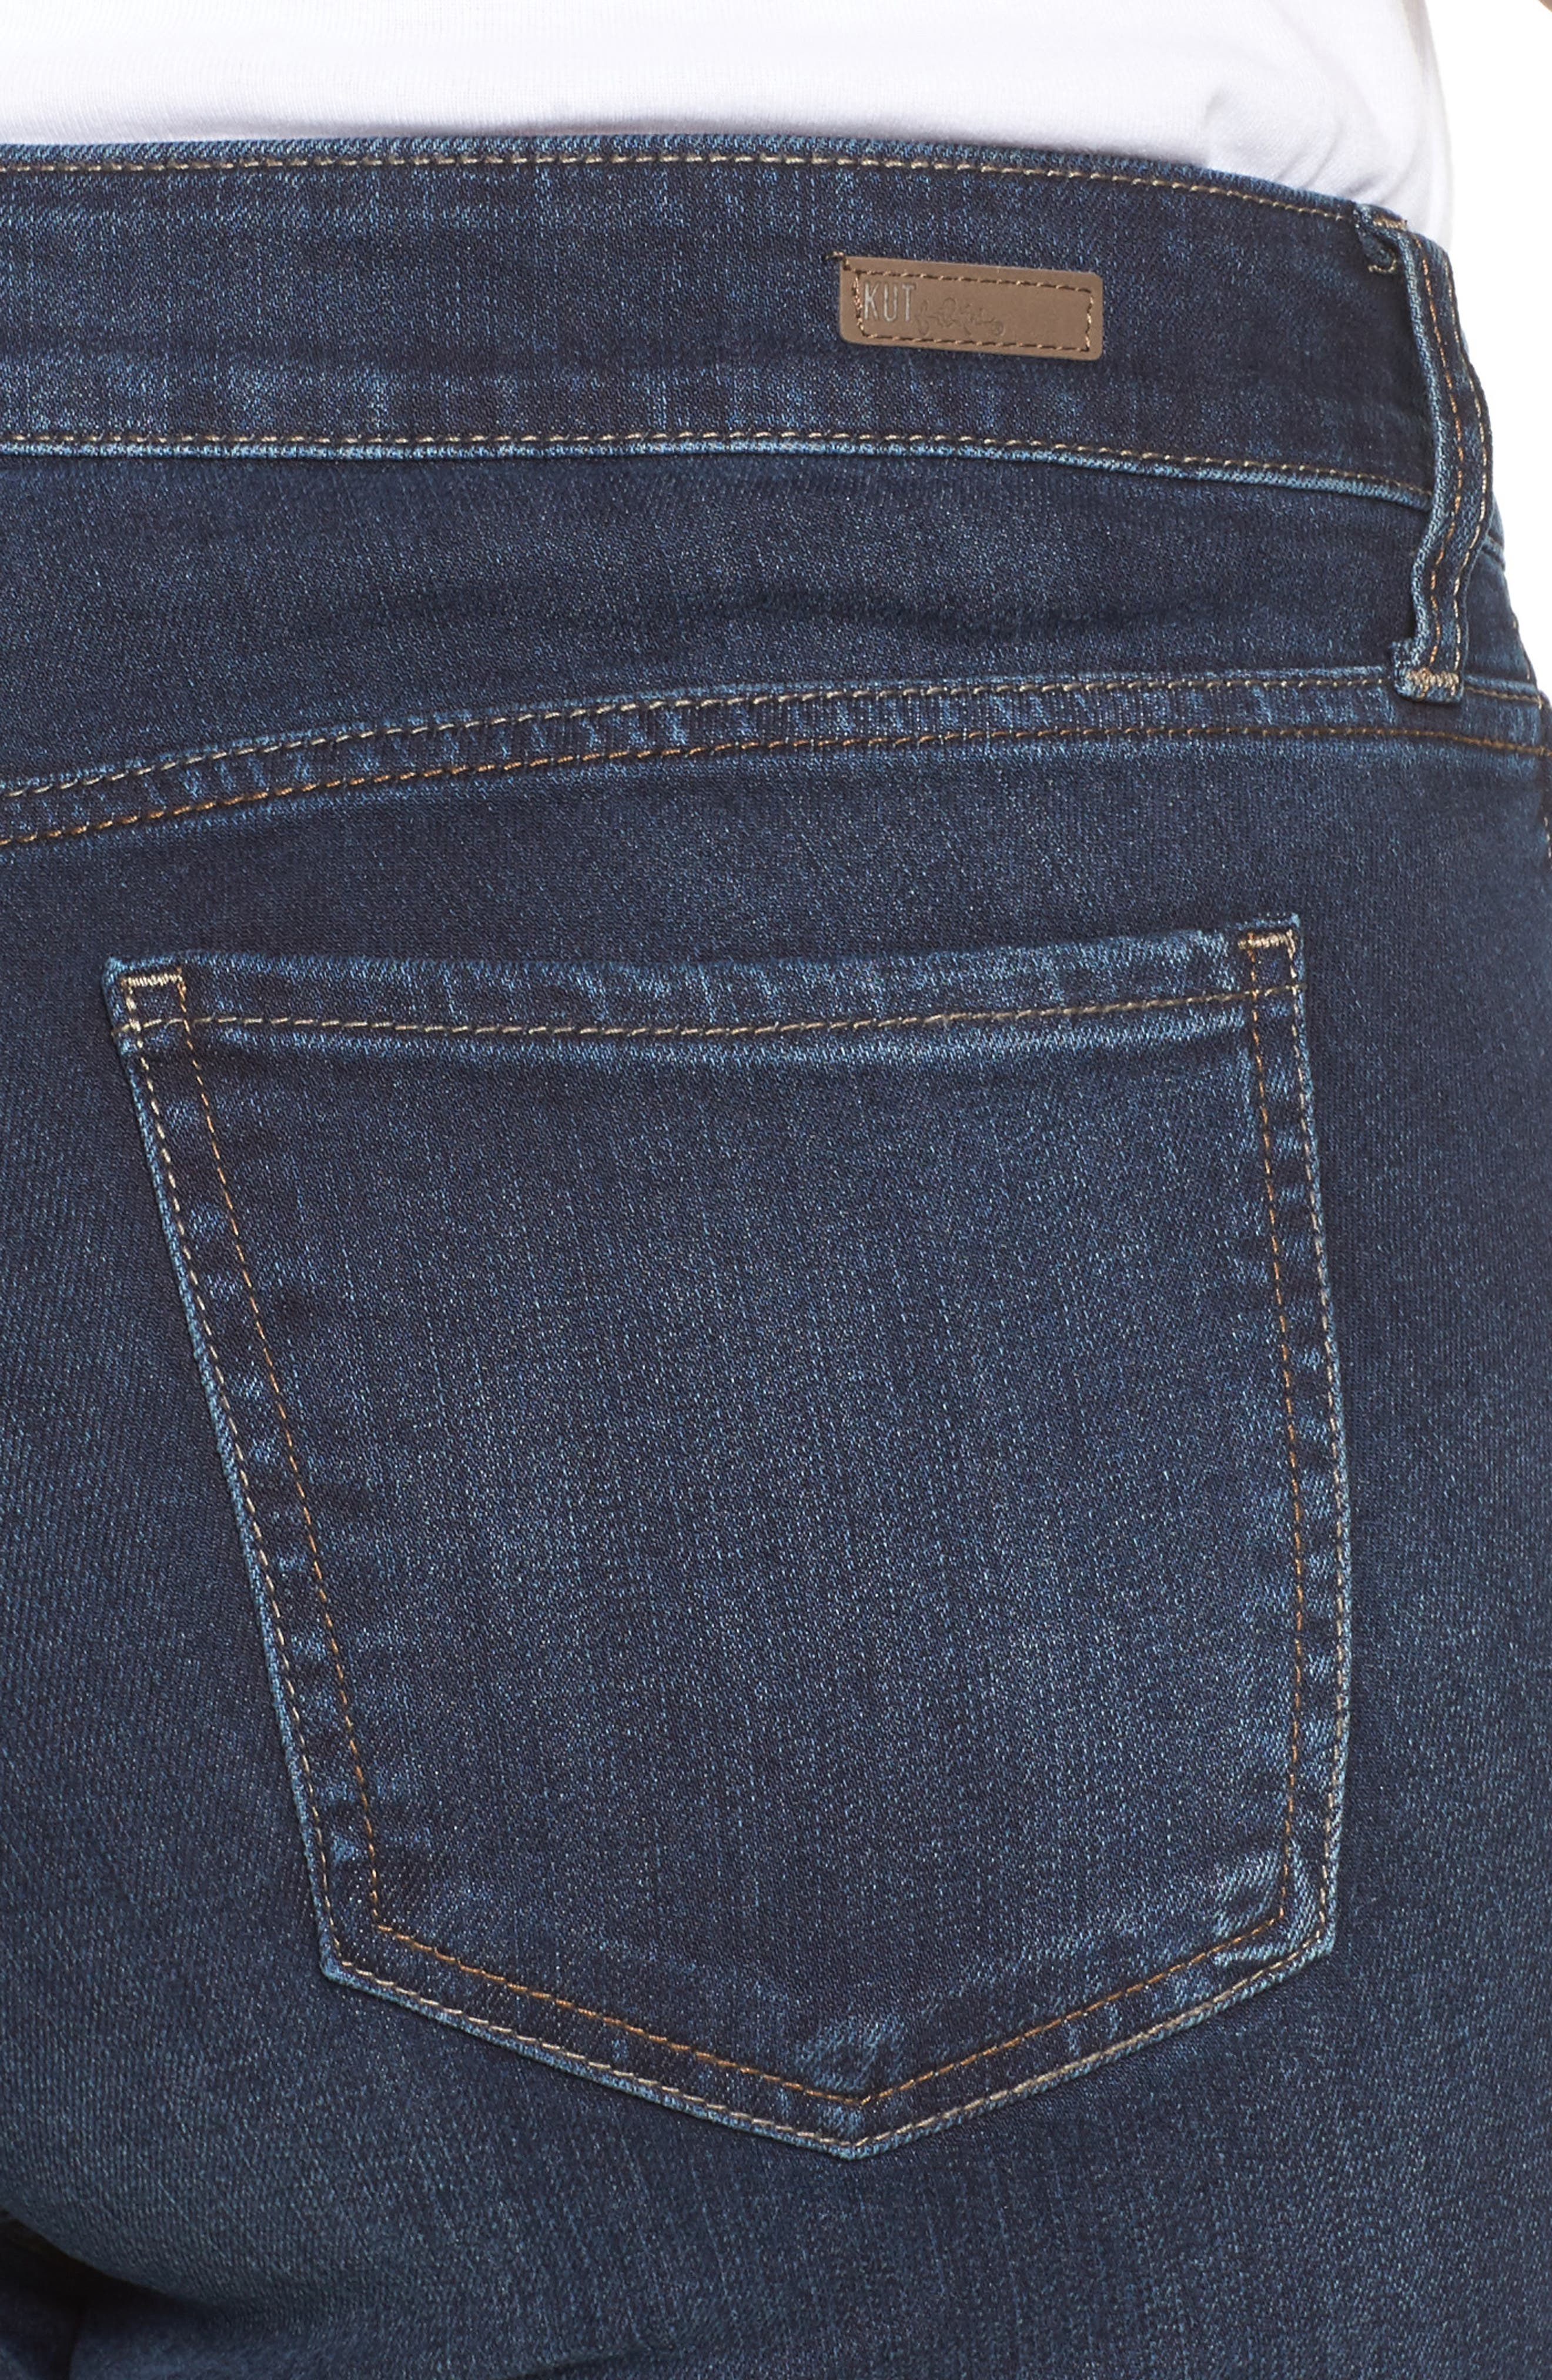 Natalie High Waist Bootcut Jeans,                             Alternate thumbnail 4, color,                             453